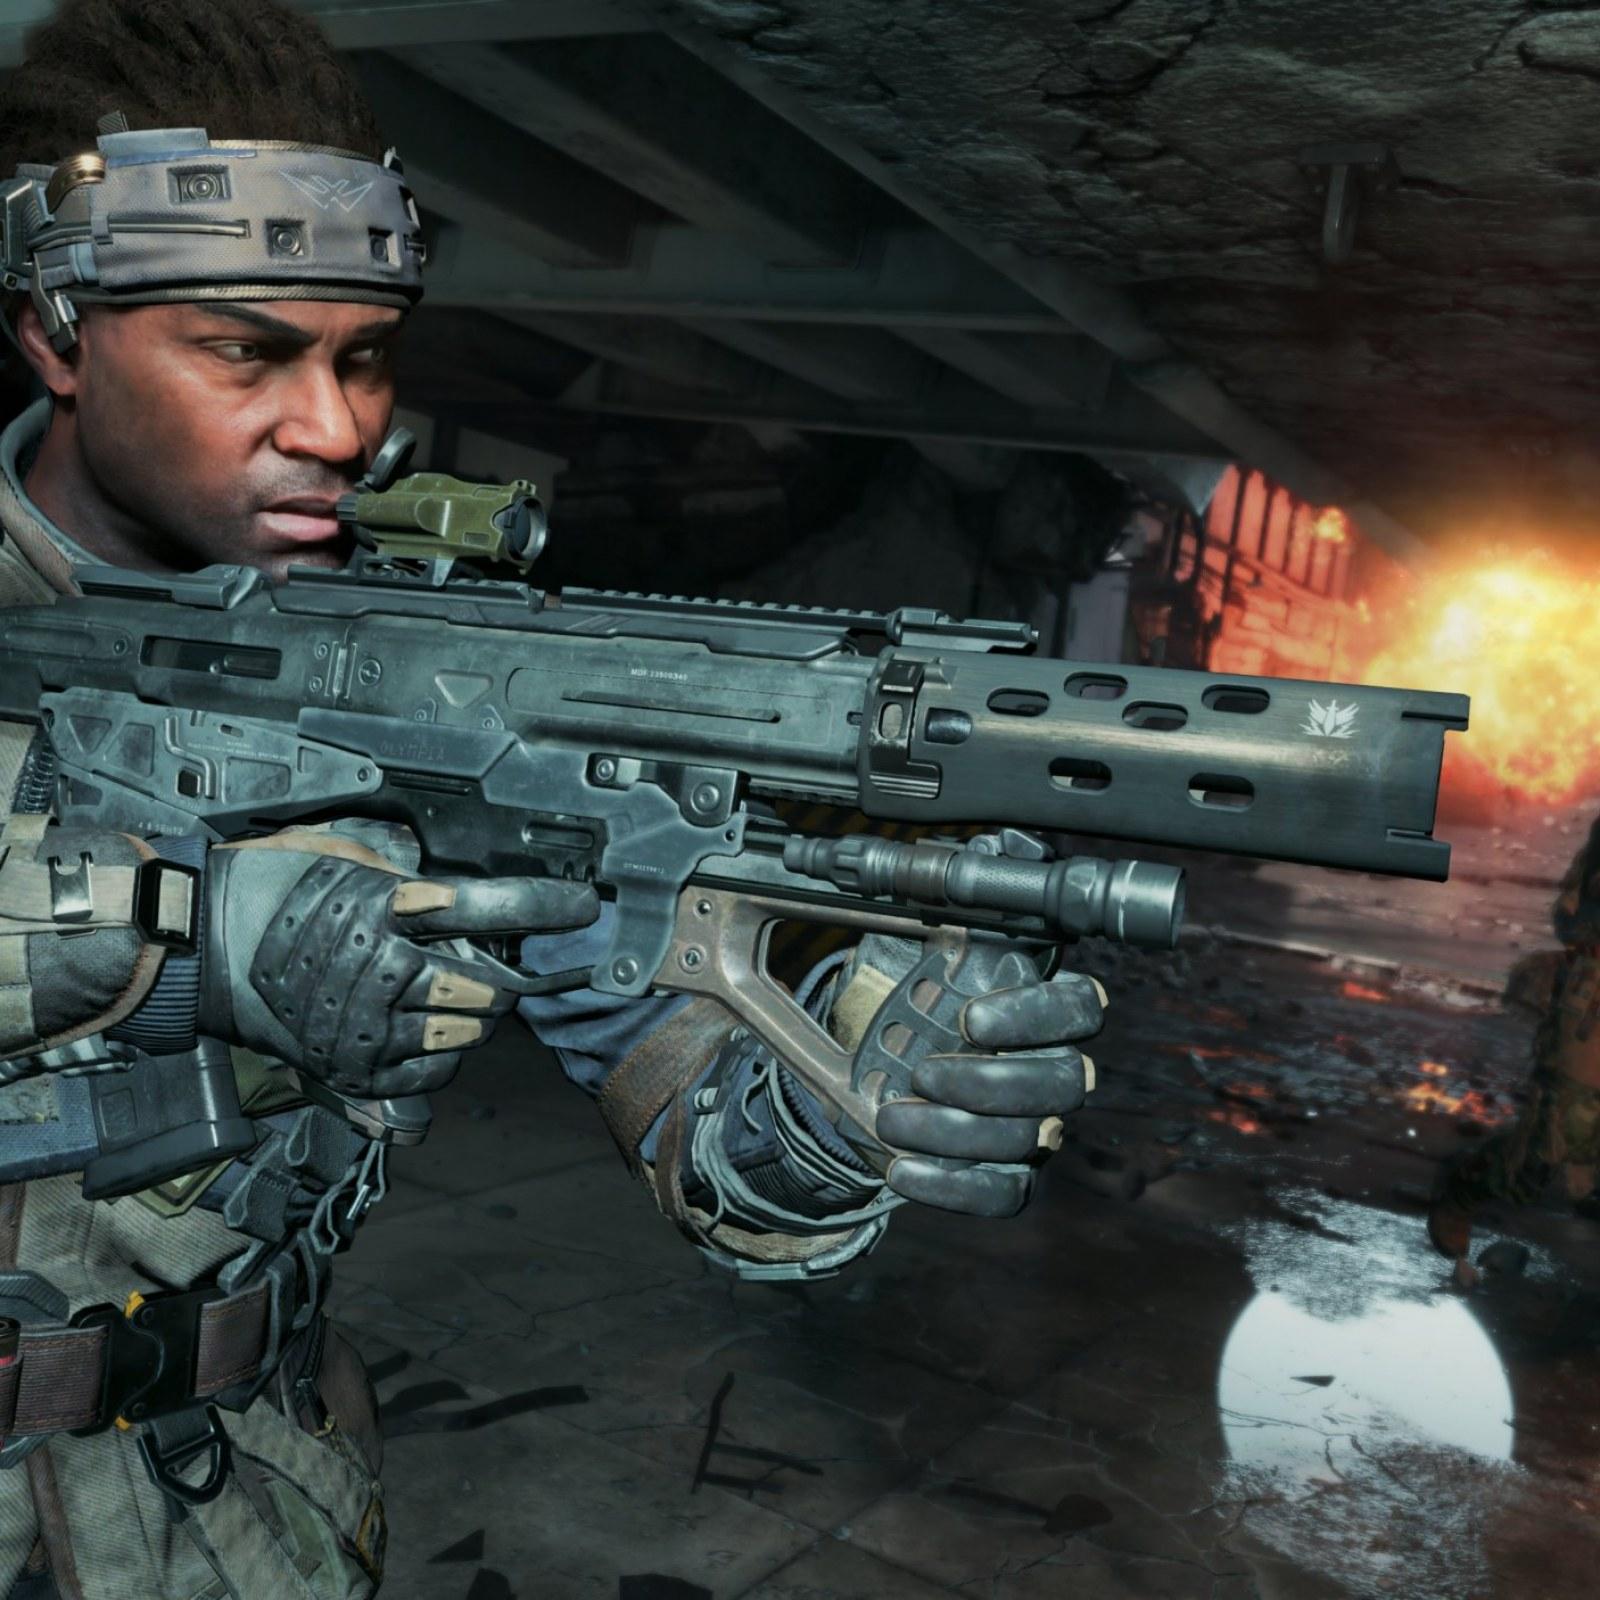 Call of Duty: Black Ops 4' Update 1 04 Adds Gun Game & Nerfs